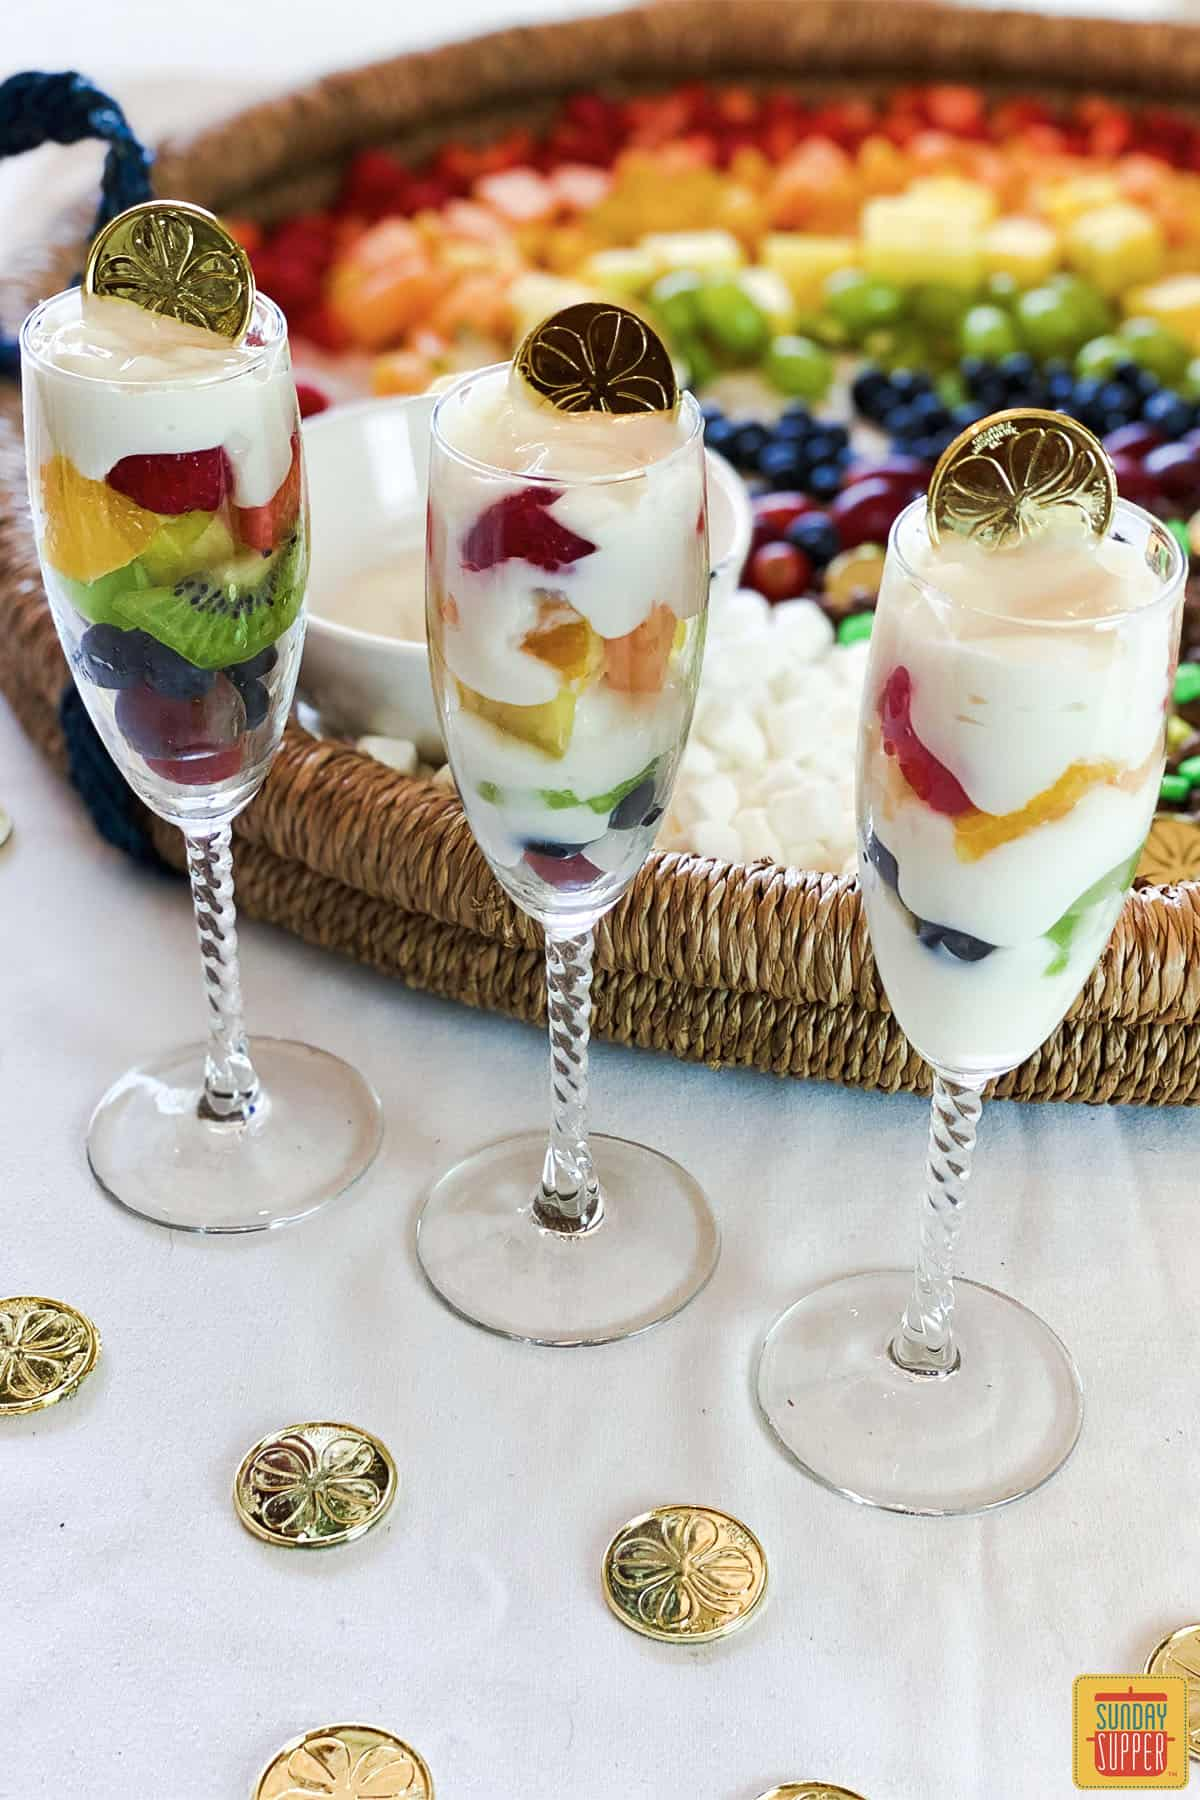 Three glasses of fruit and yogurt parfait